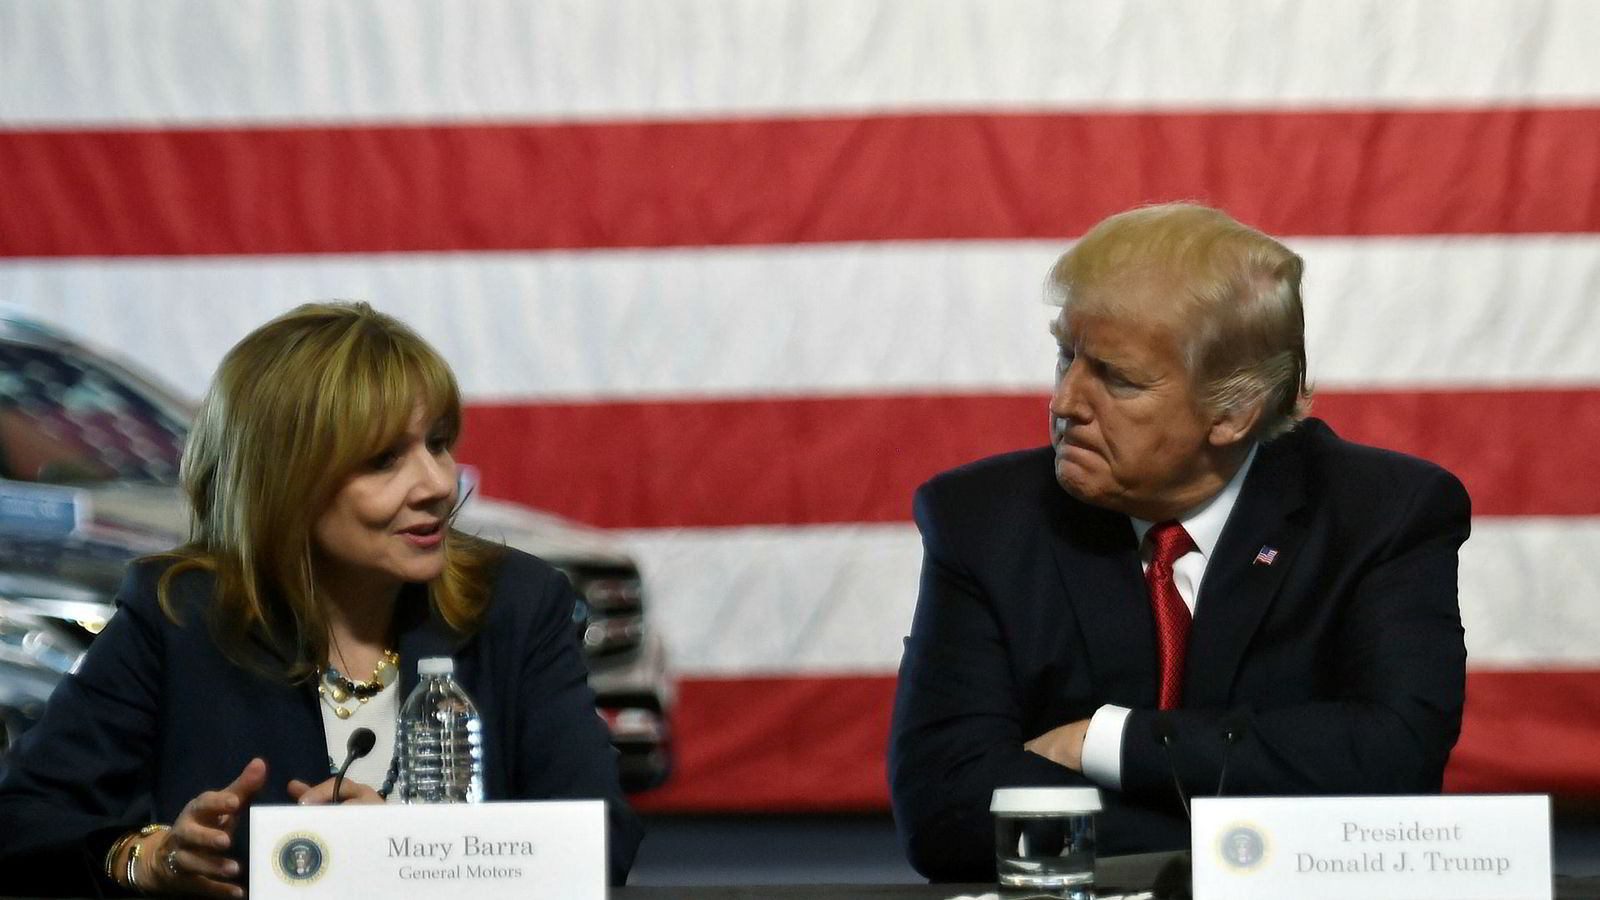 President Donald Trump er meget irritert på General Motors-sjef Mary Barra. Her fra et møte i Michigan i fjor.